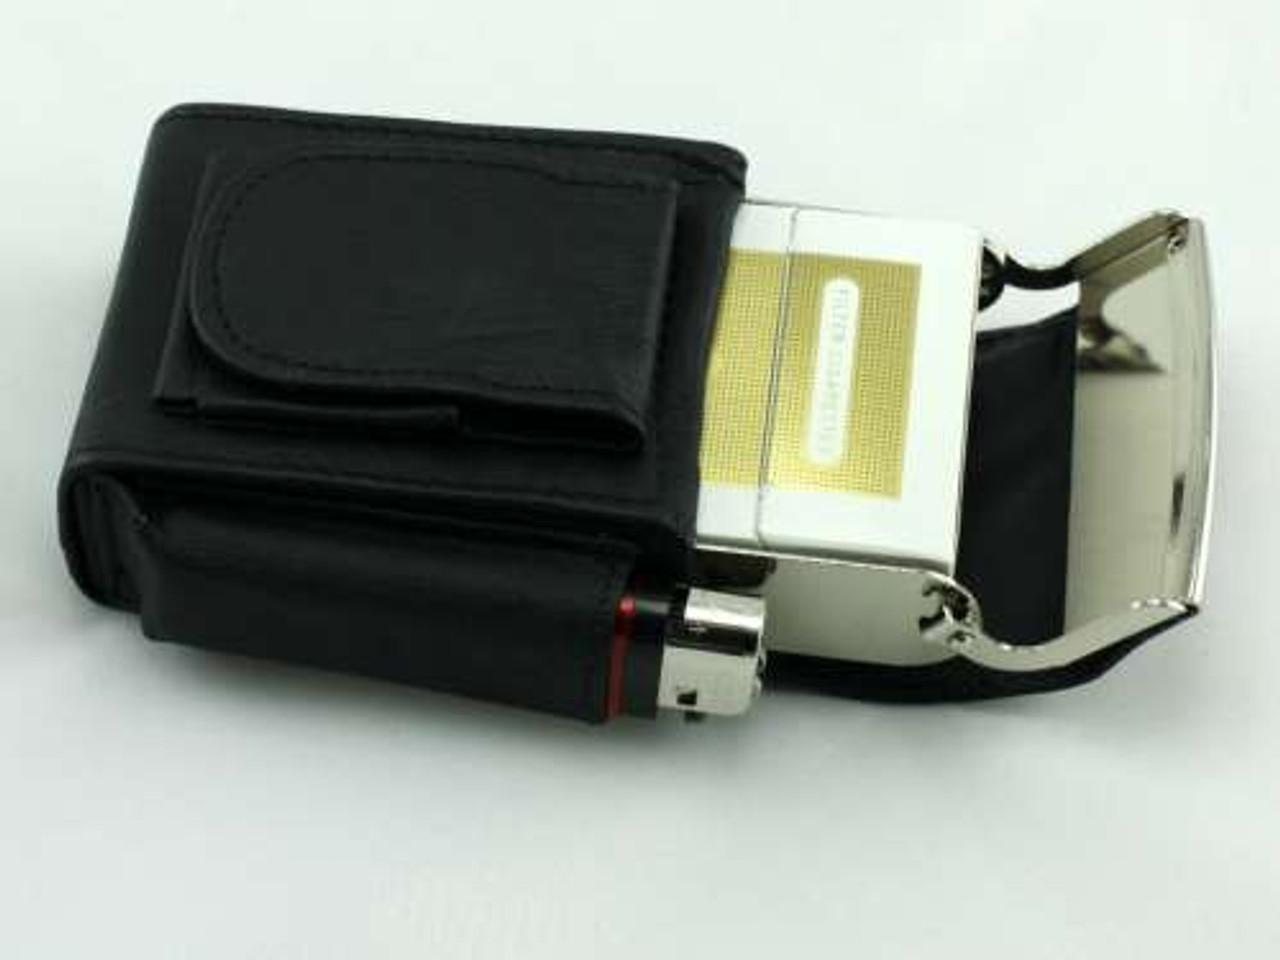 Black Box Leather Cigarette Pack Holder